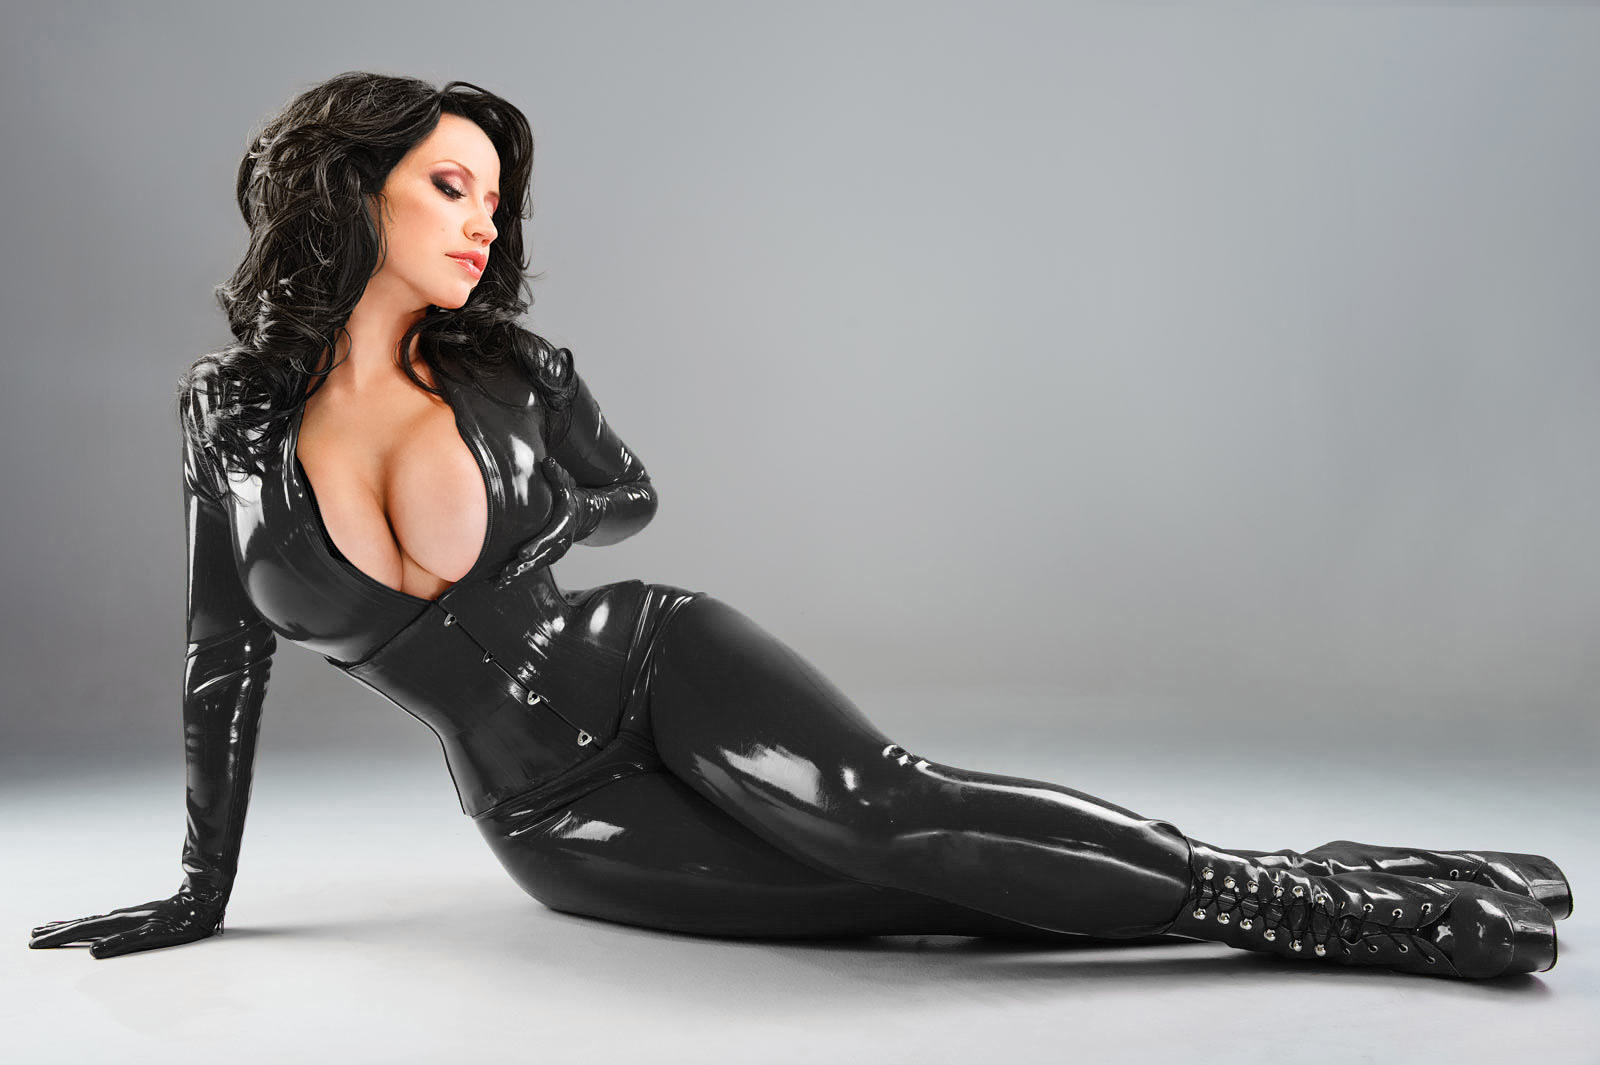 wichs forum catwoman kostüm latex